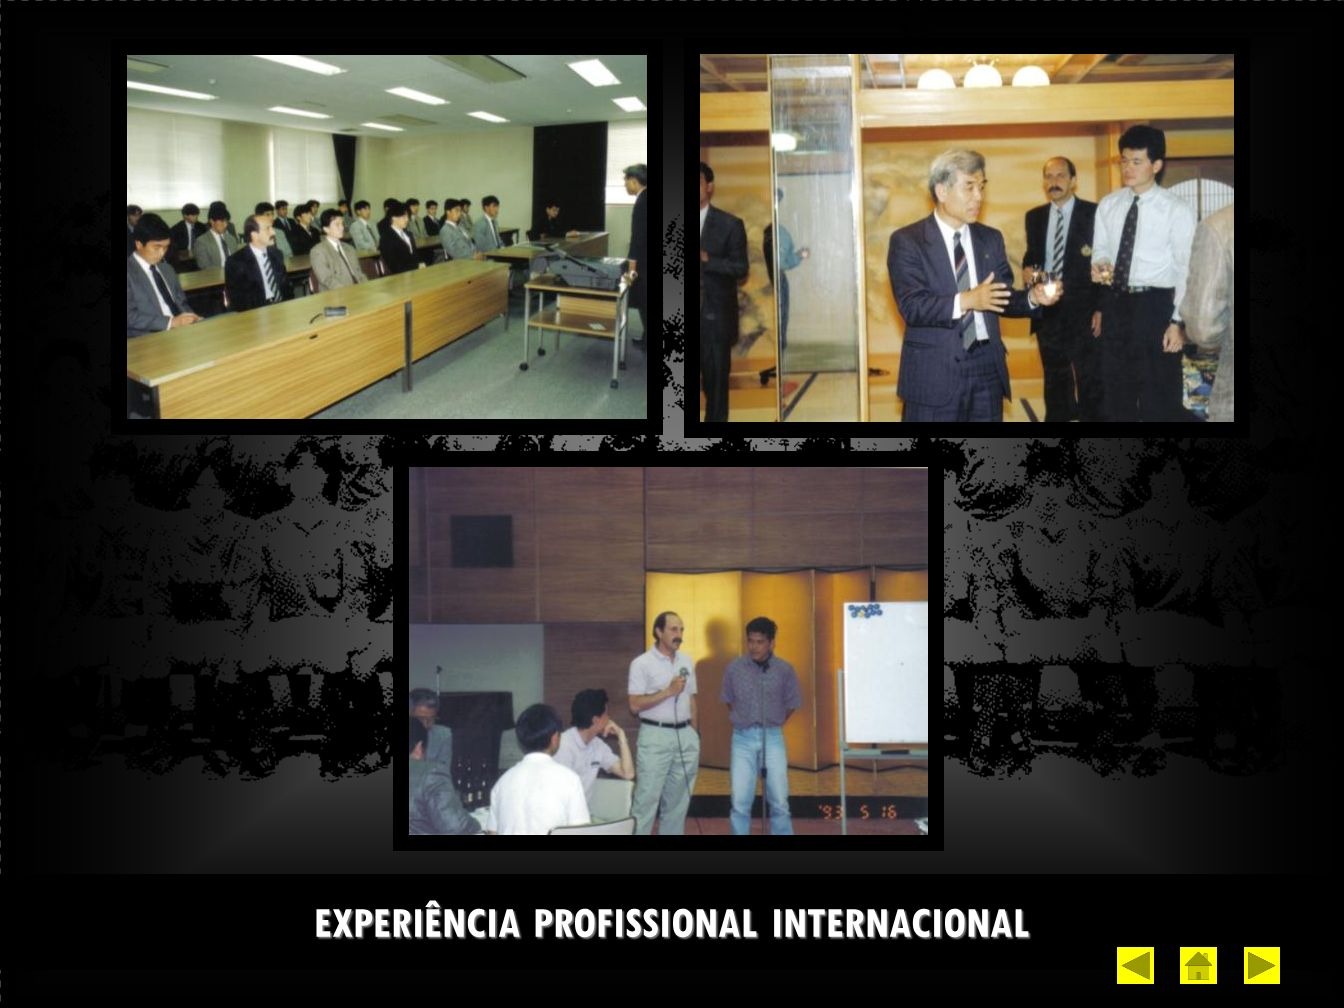 EXPERIÊNCIA PROFISSIONAL INTERNACIONAL